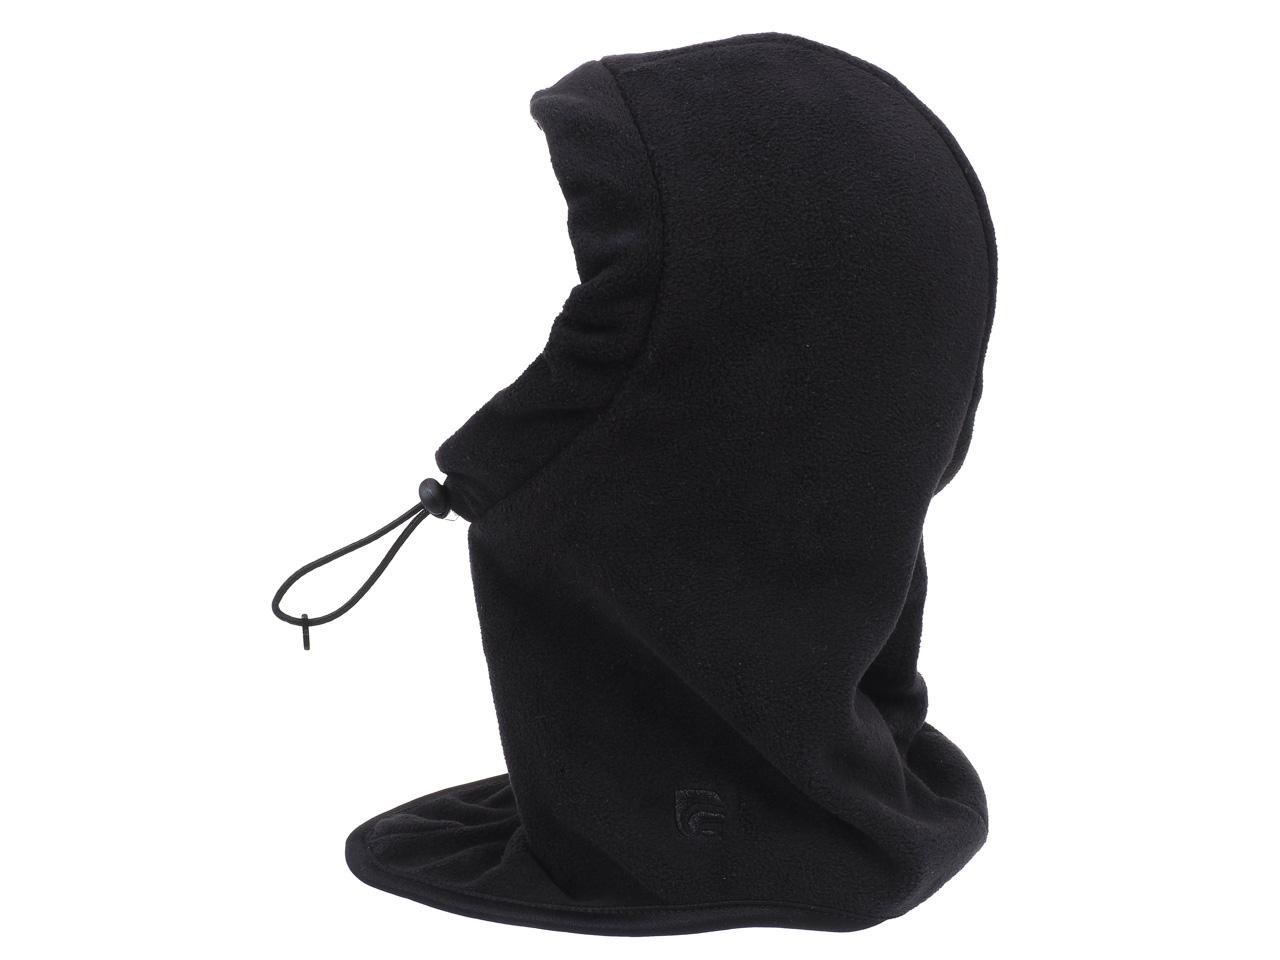 Hood-Winter-Cairn-Hood-Black-Polar-Jr-Black-31198-New thumbnail 2